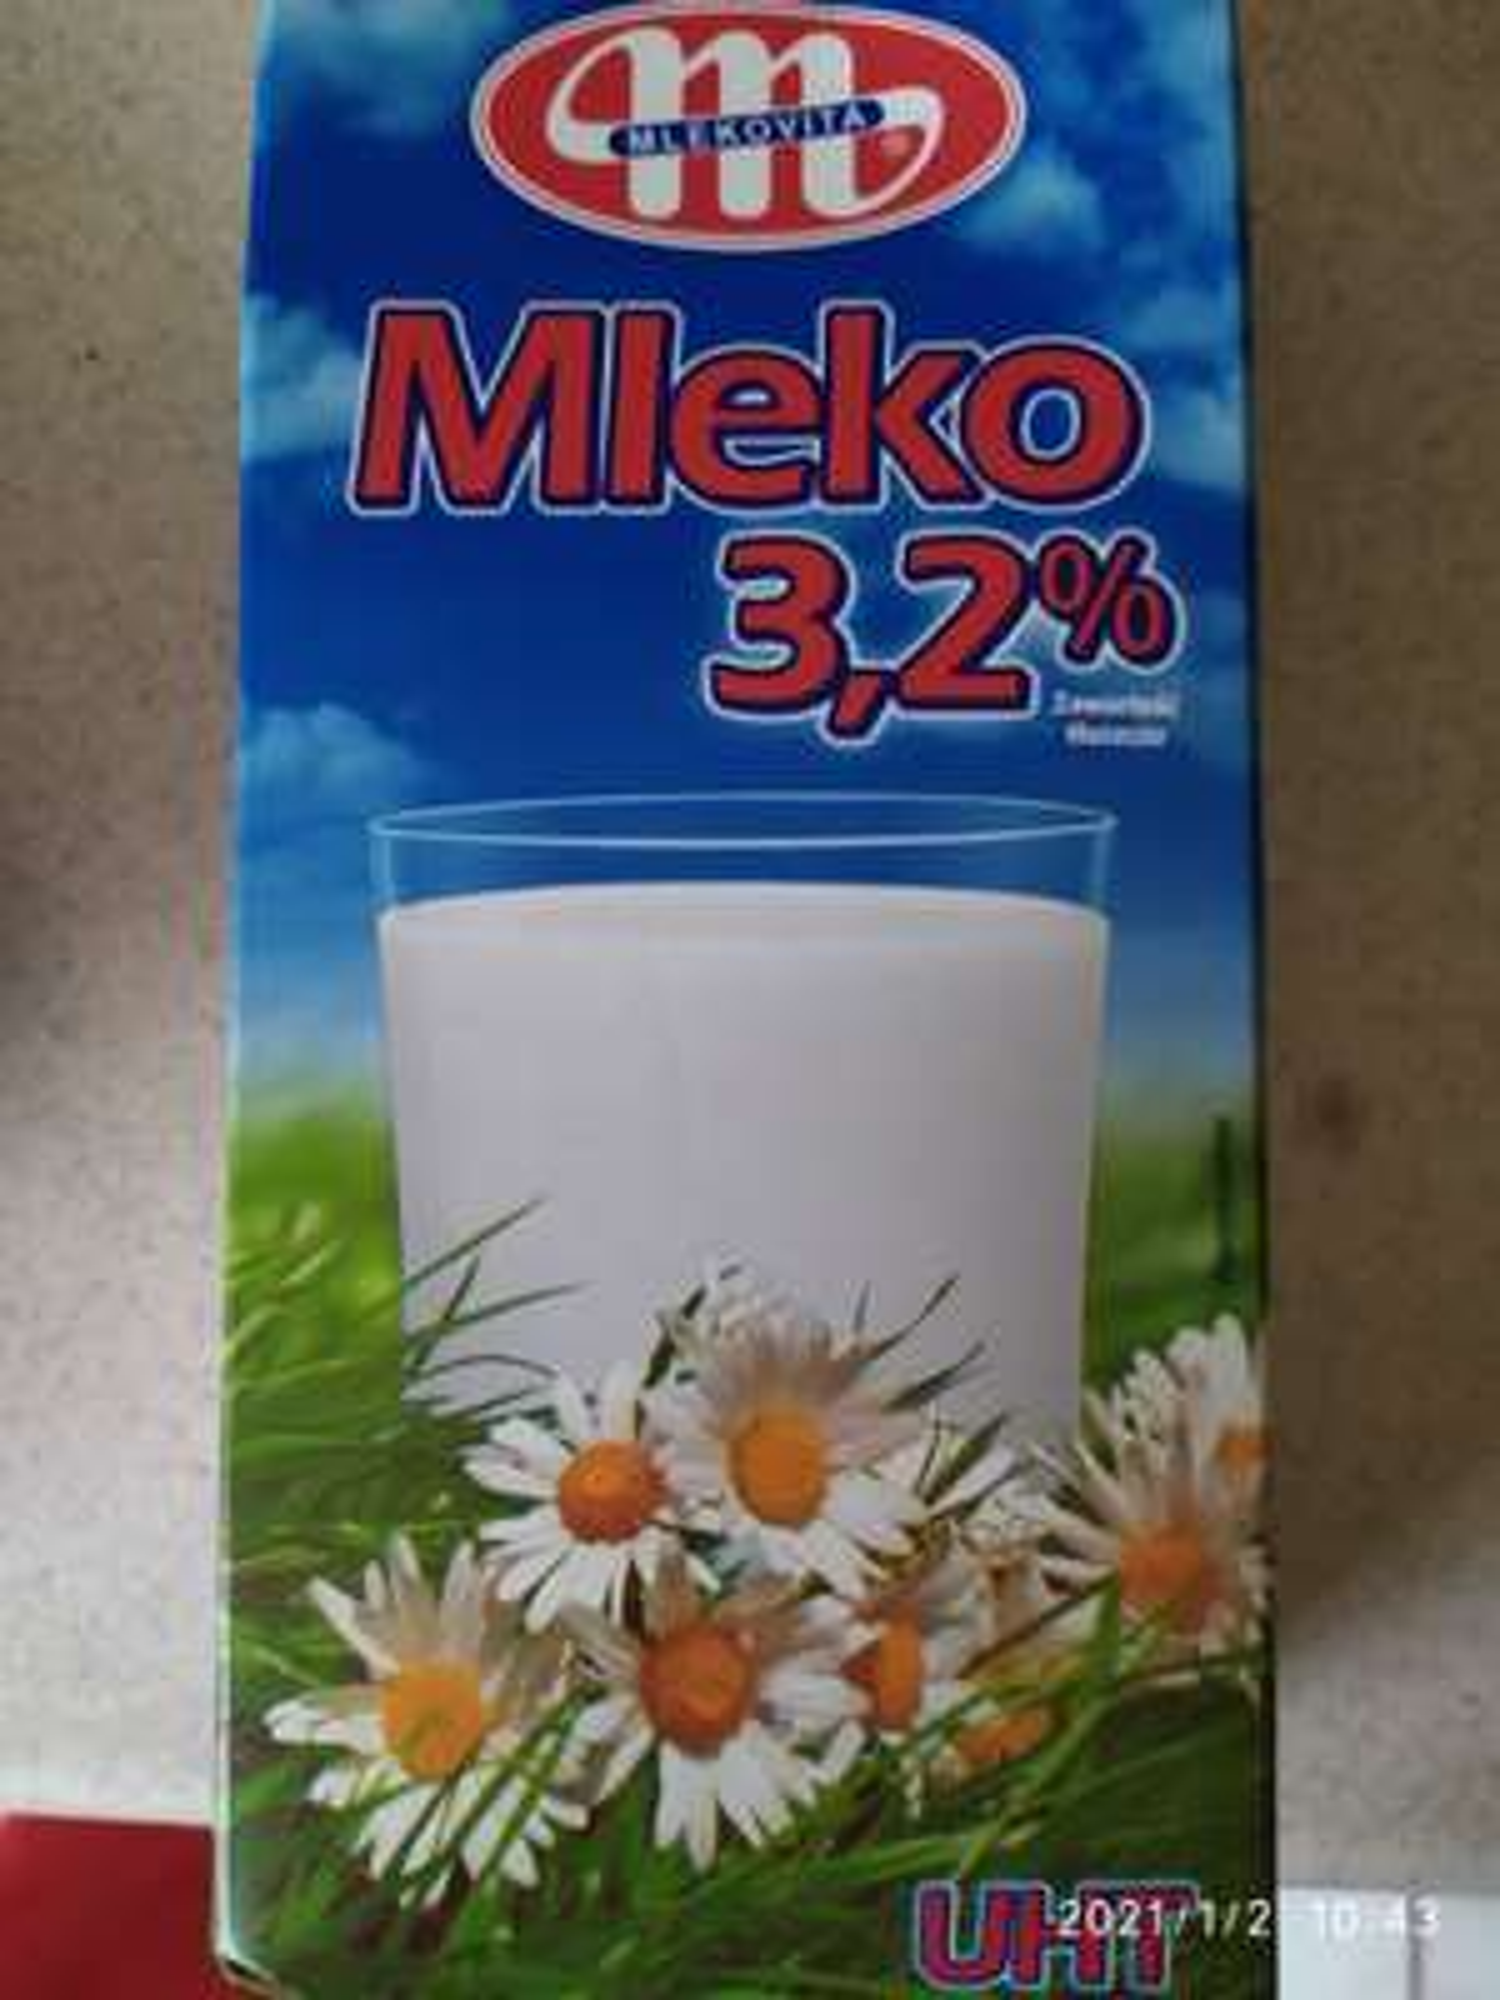 Lidl Mleko UHT Mlekowita 1l 3.2% Częstochowa Raków.